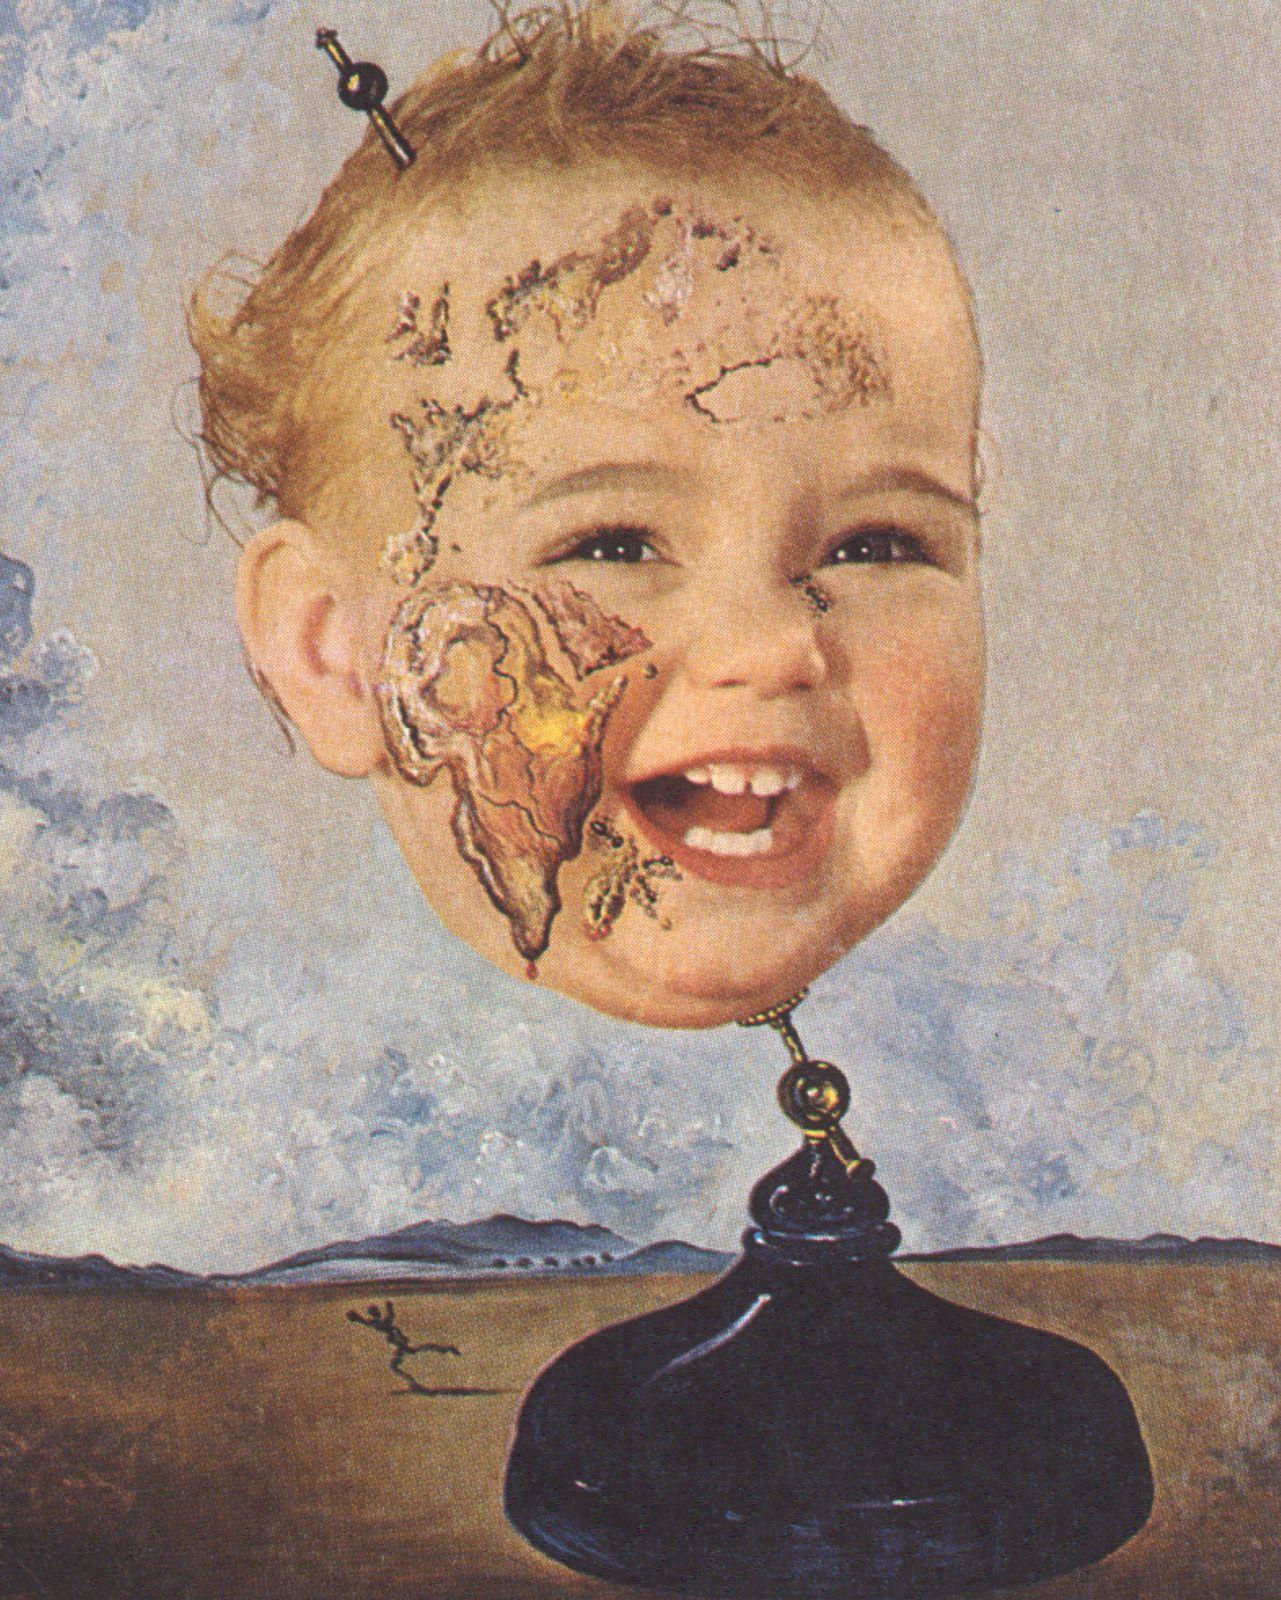 Baby Map of the World - Dali Salvador Dali Artwork, Salvador Dali  Paintings, Surreal